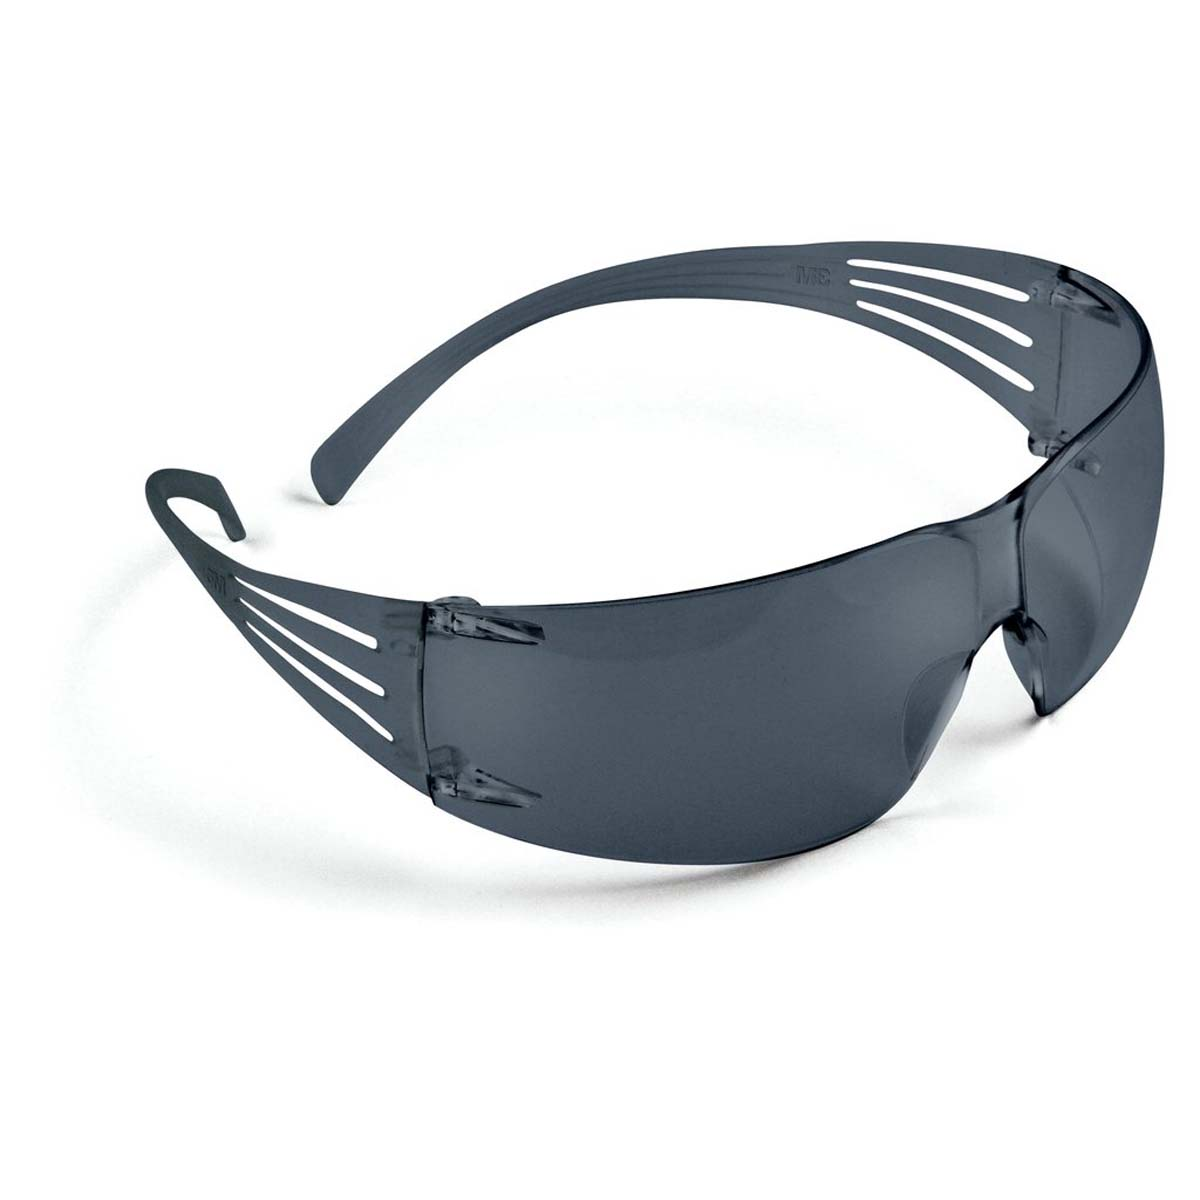 "3Mâ""¢ SecureFitâ""¢ Protective Eyewear SF202AF, Gray Lens,"